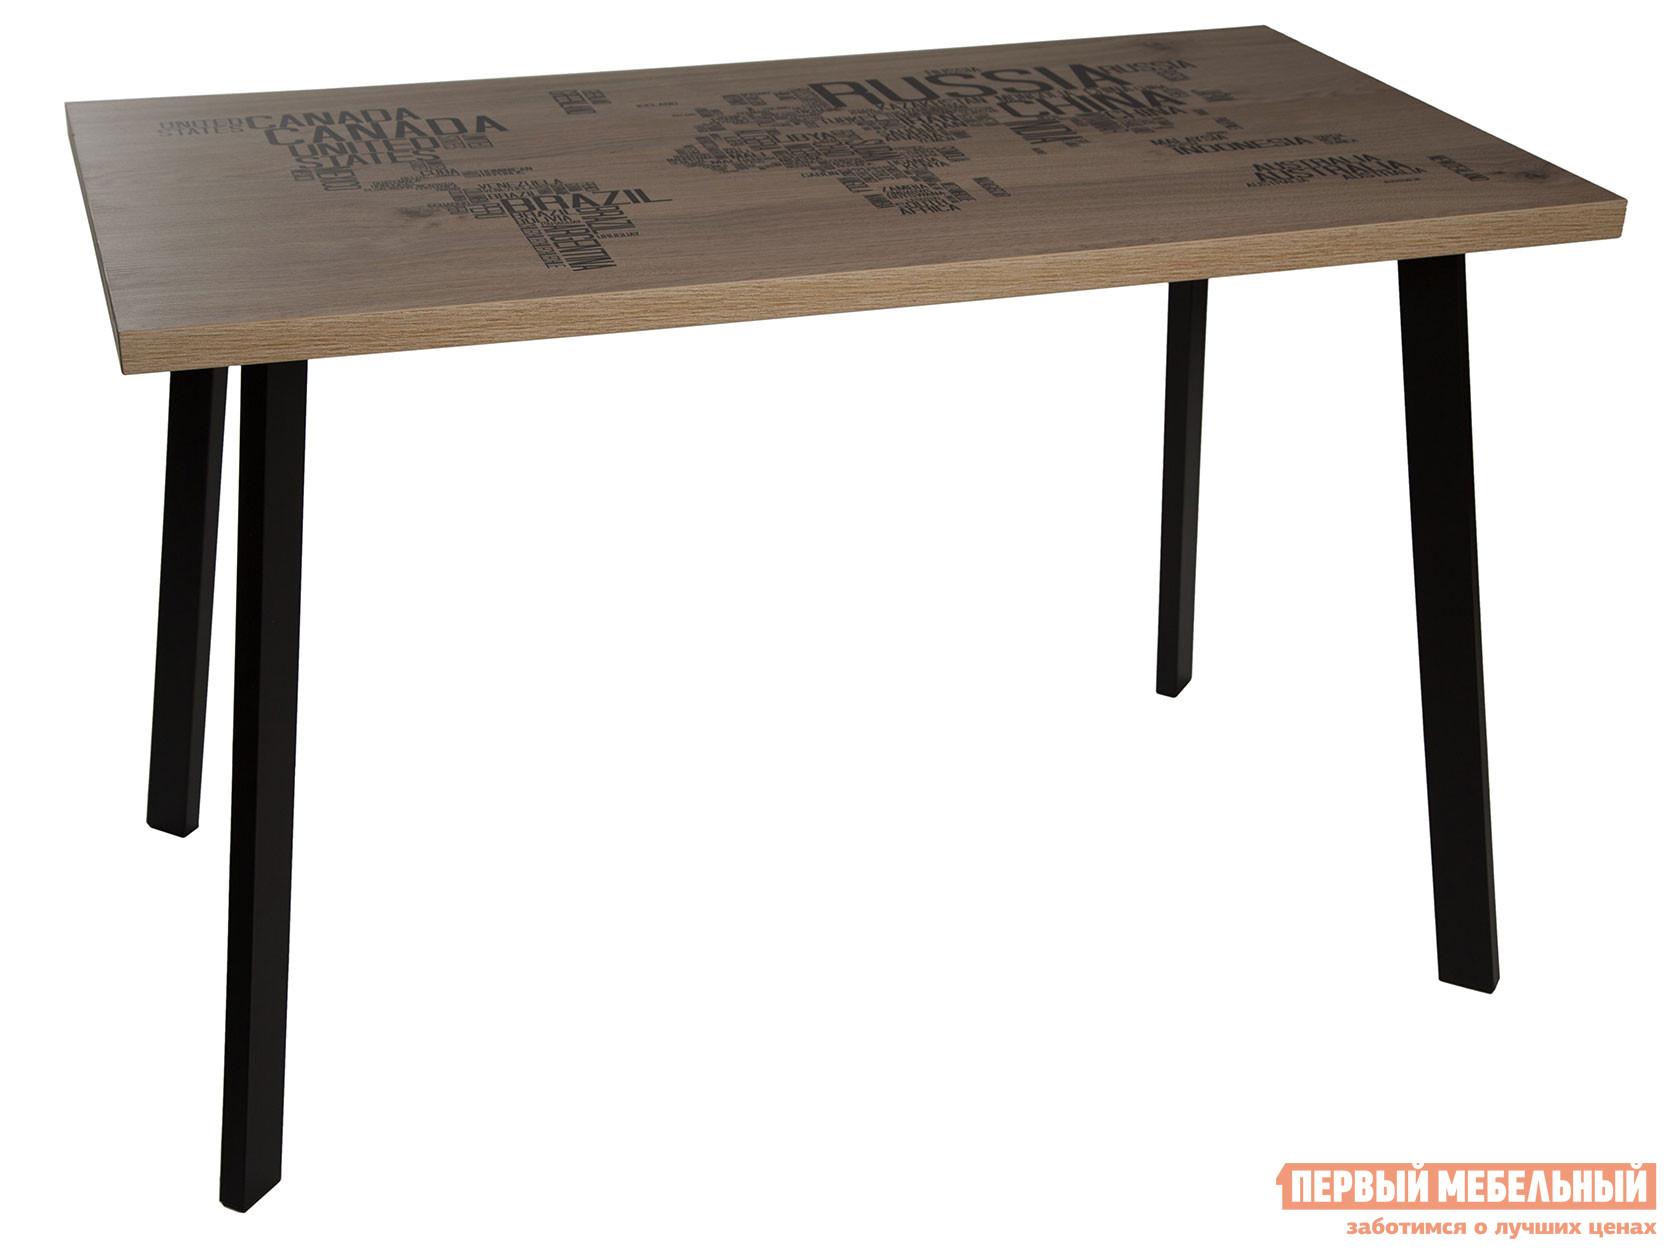 Кухонный стол Линоторг DP-010208501 Стол ДП1-02-08 1200*640 М95